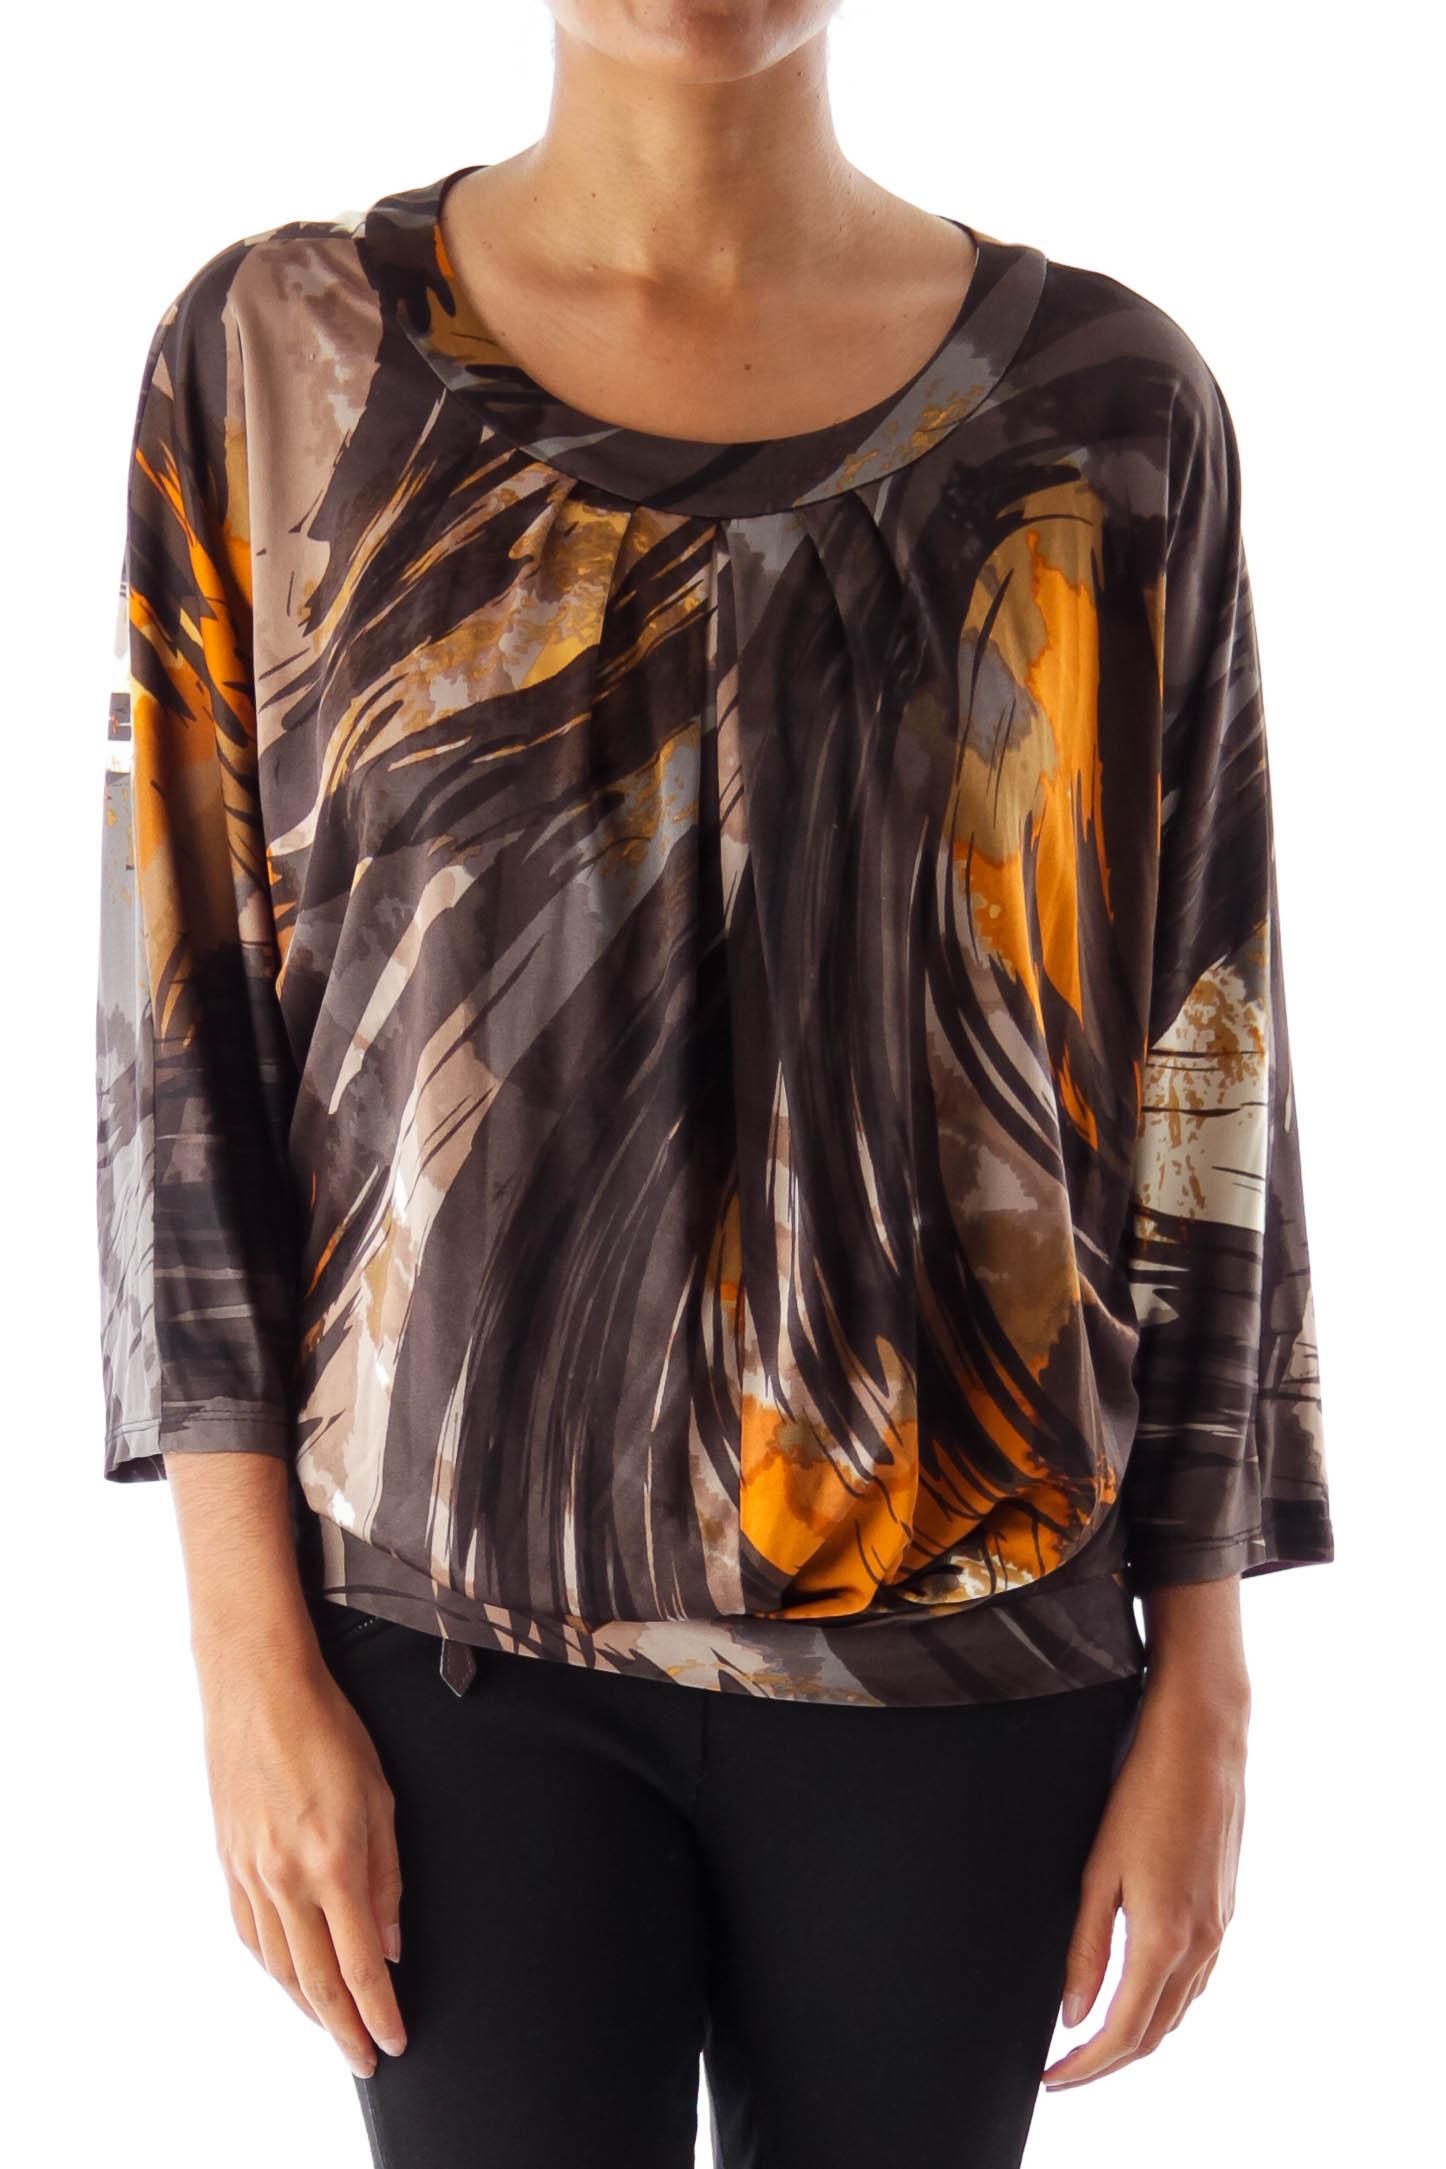 Black & Brown Print Shirt